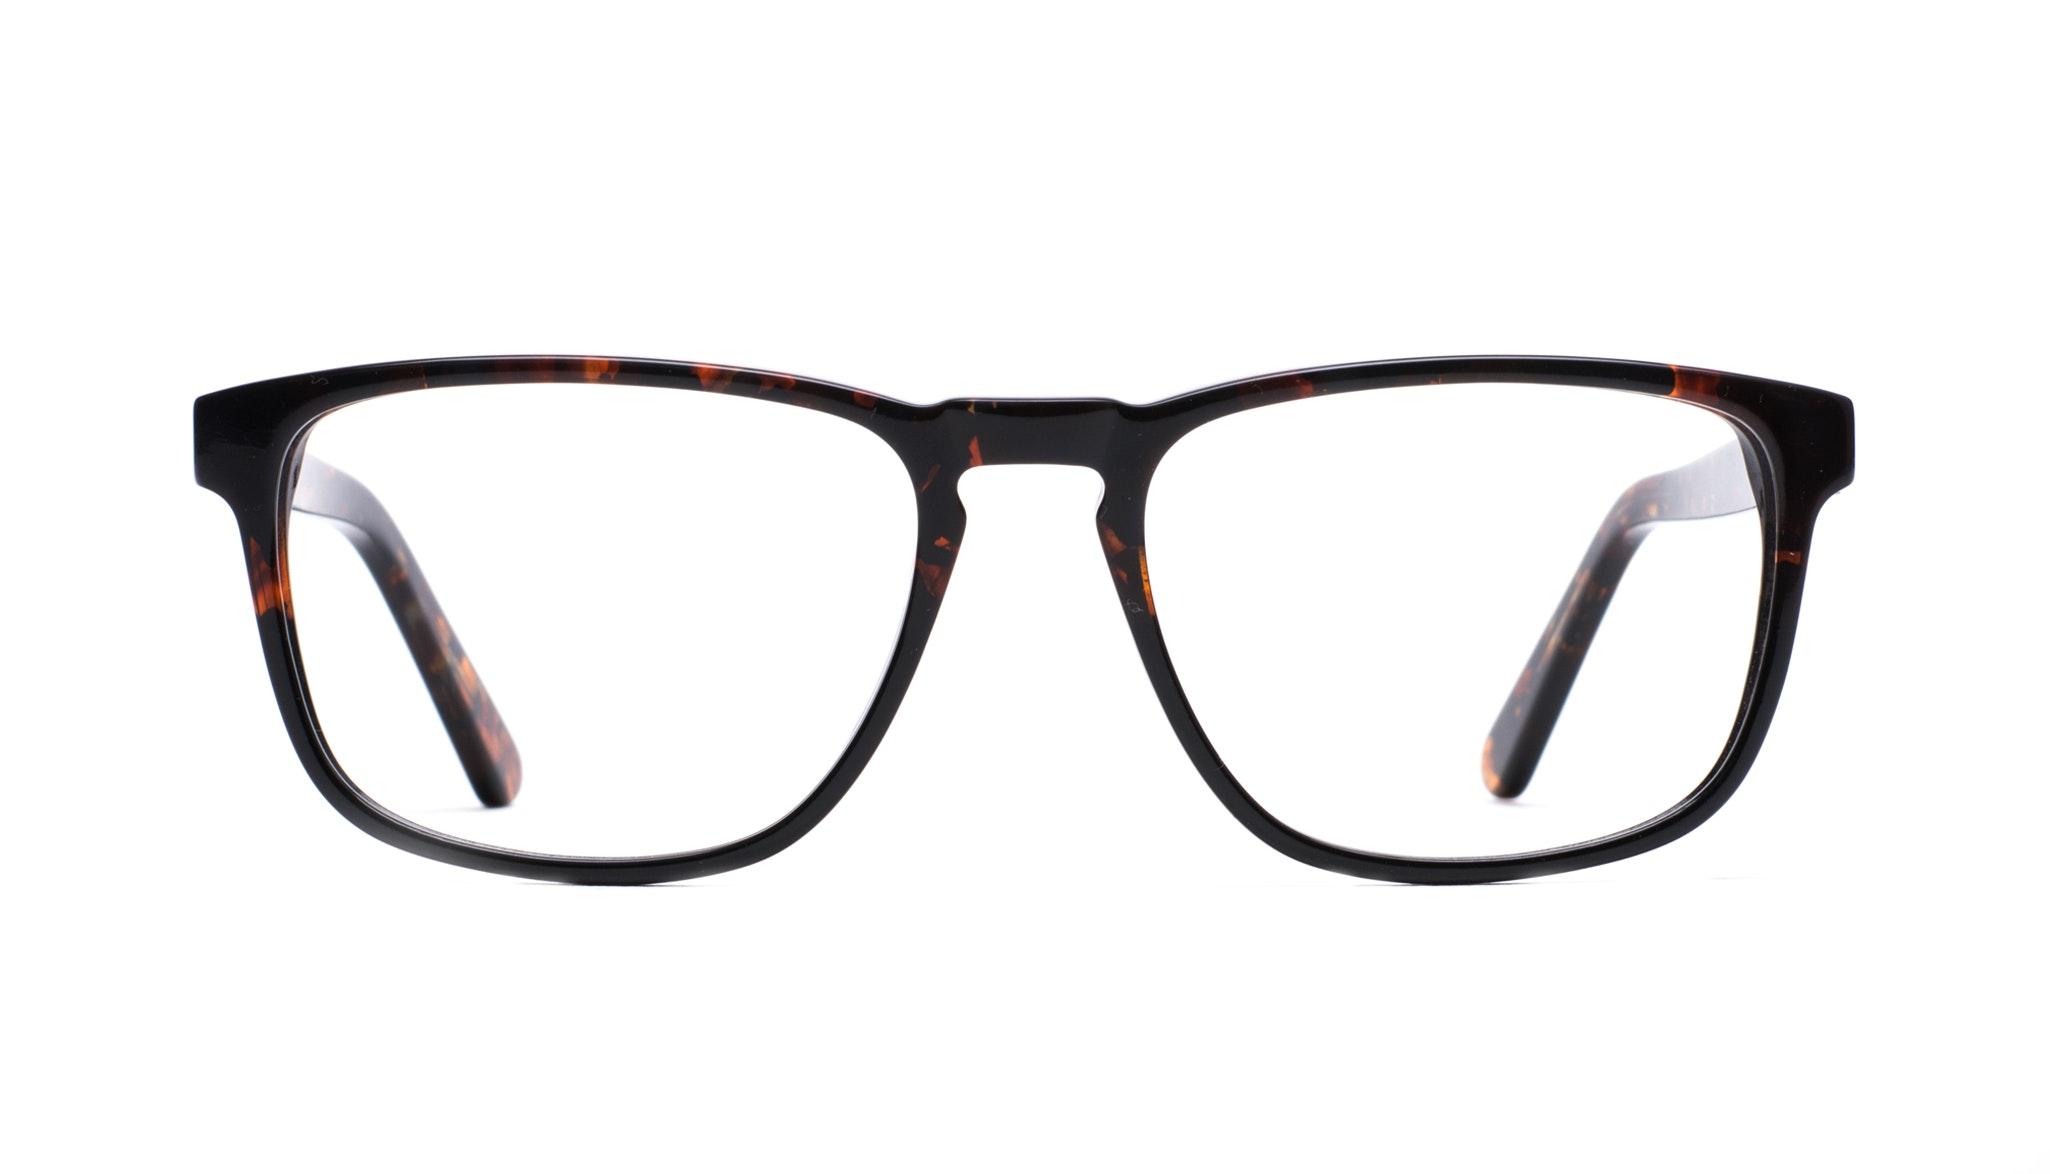 Affordable Fashion Glasses Rectangle Eyeglasses Men Loft Mahogany Black Front